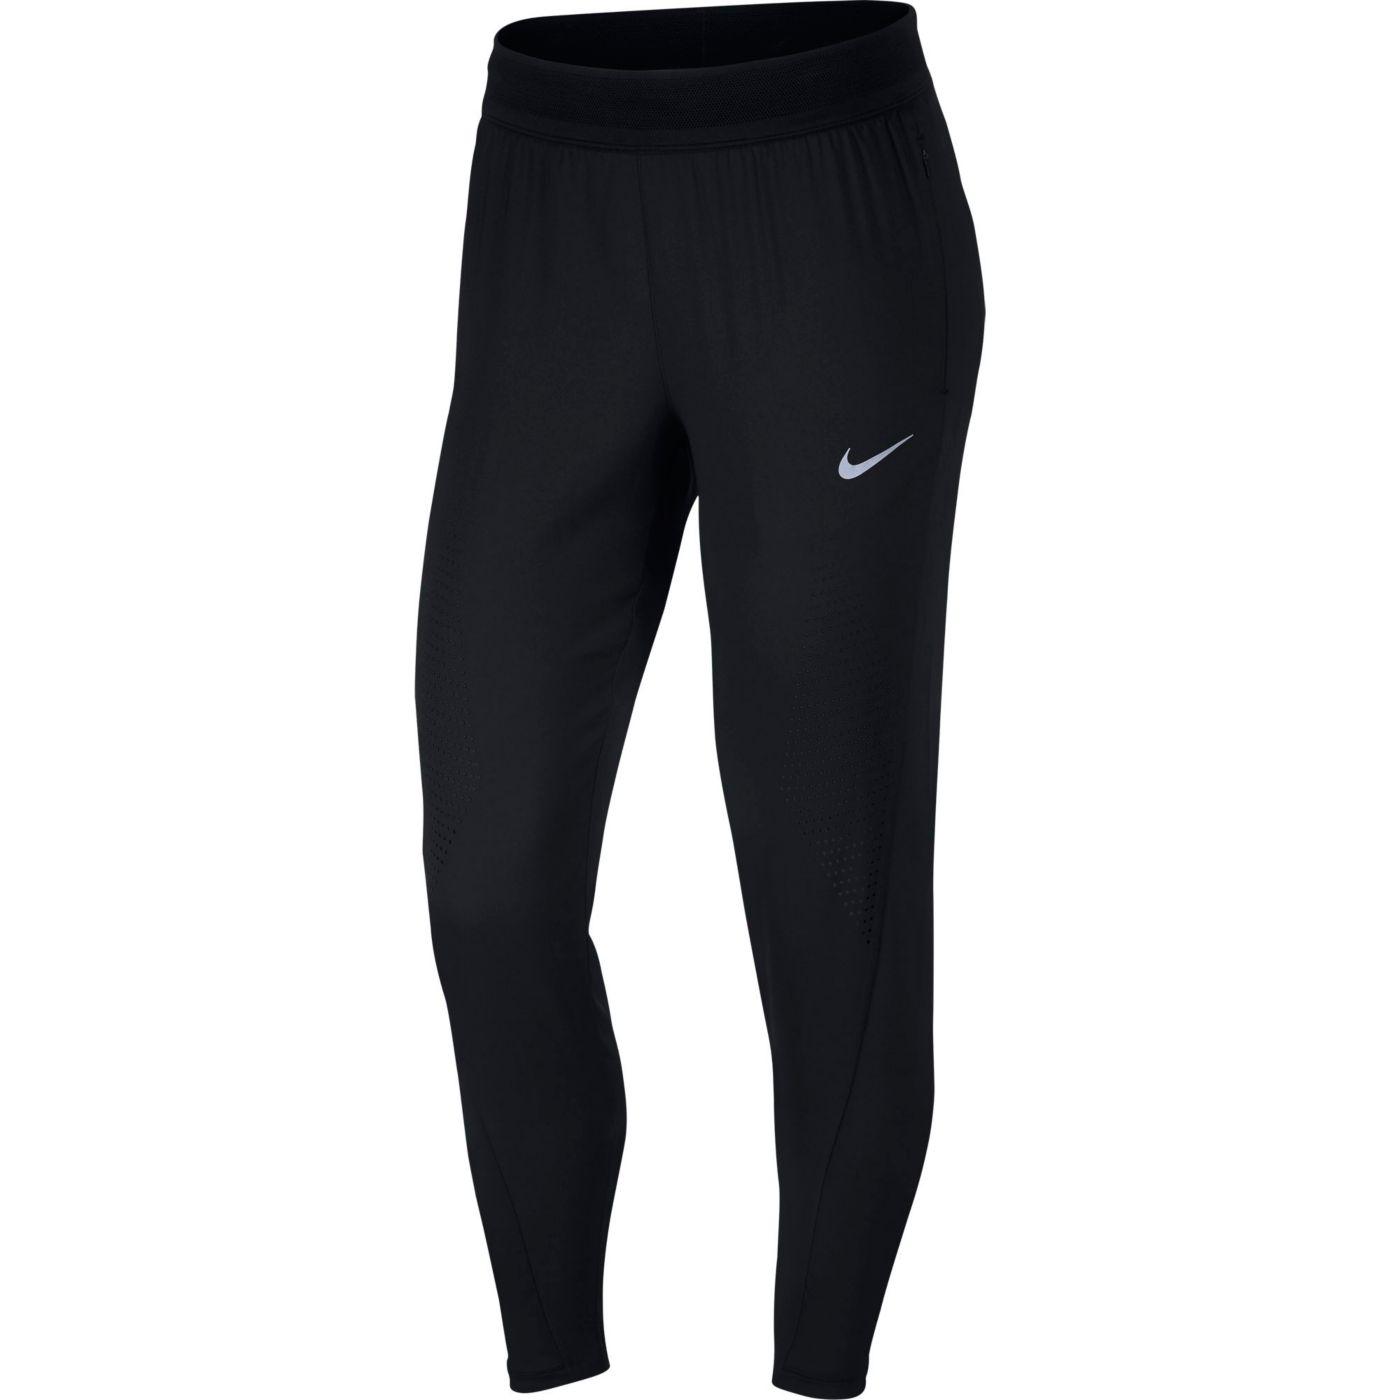 Nike Women's Swift Running Pants